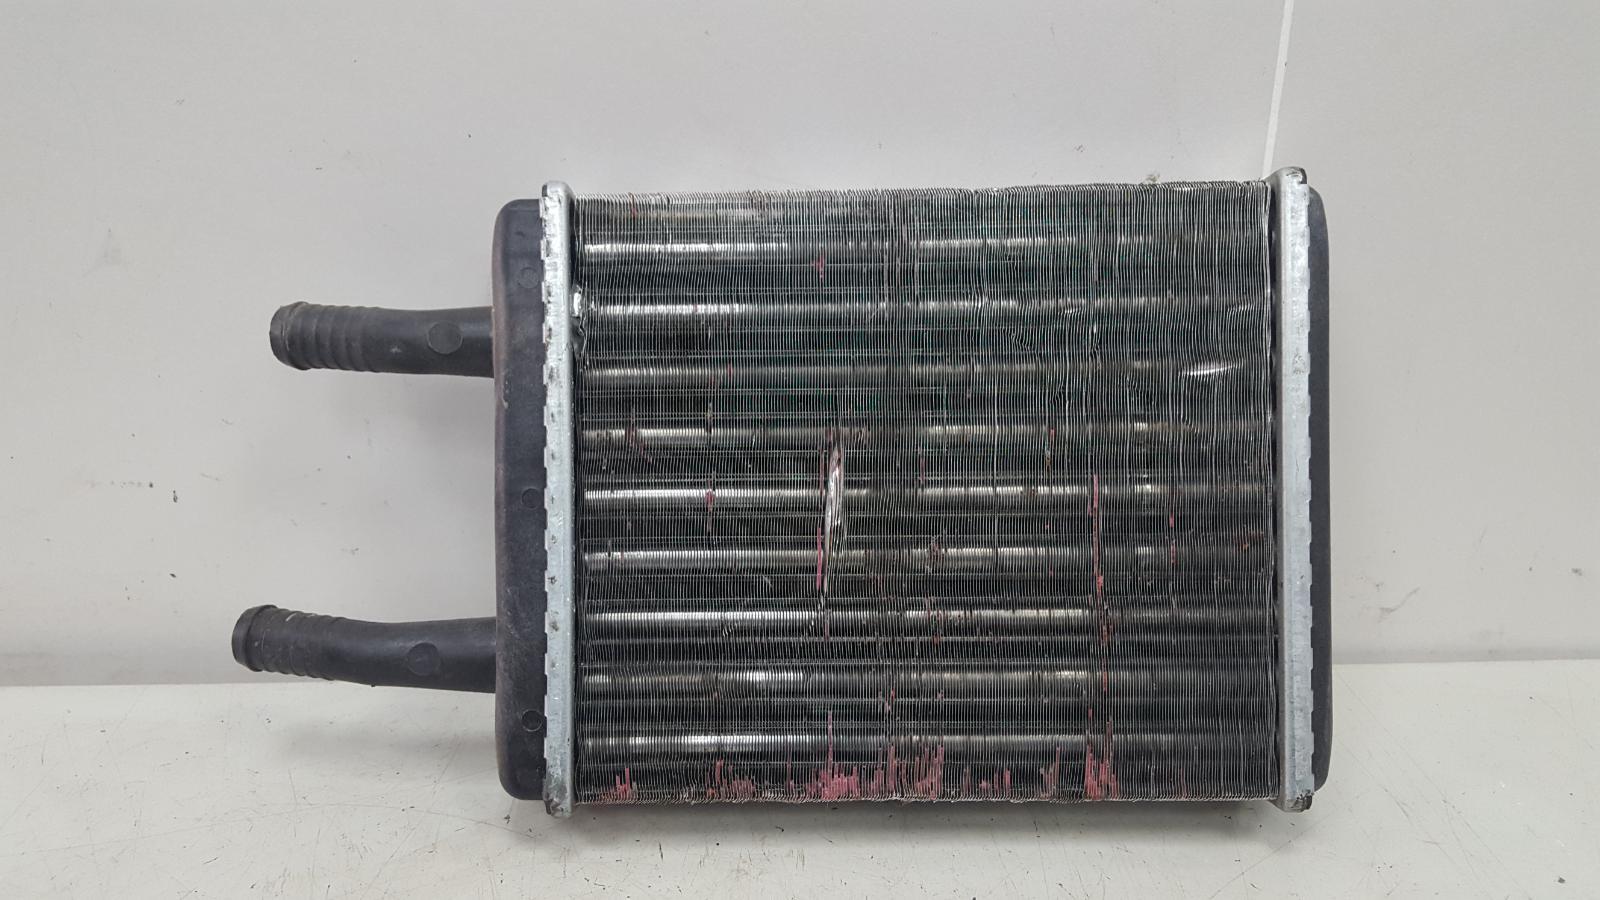 Радиатор печки Газ Волга 31105 EDZ 2.4Л 2007